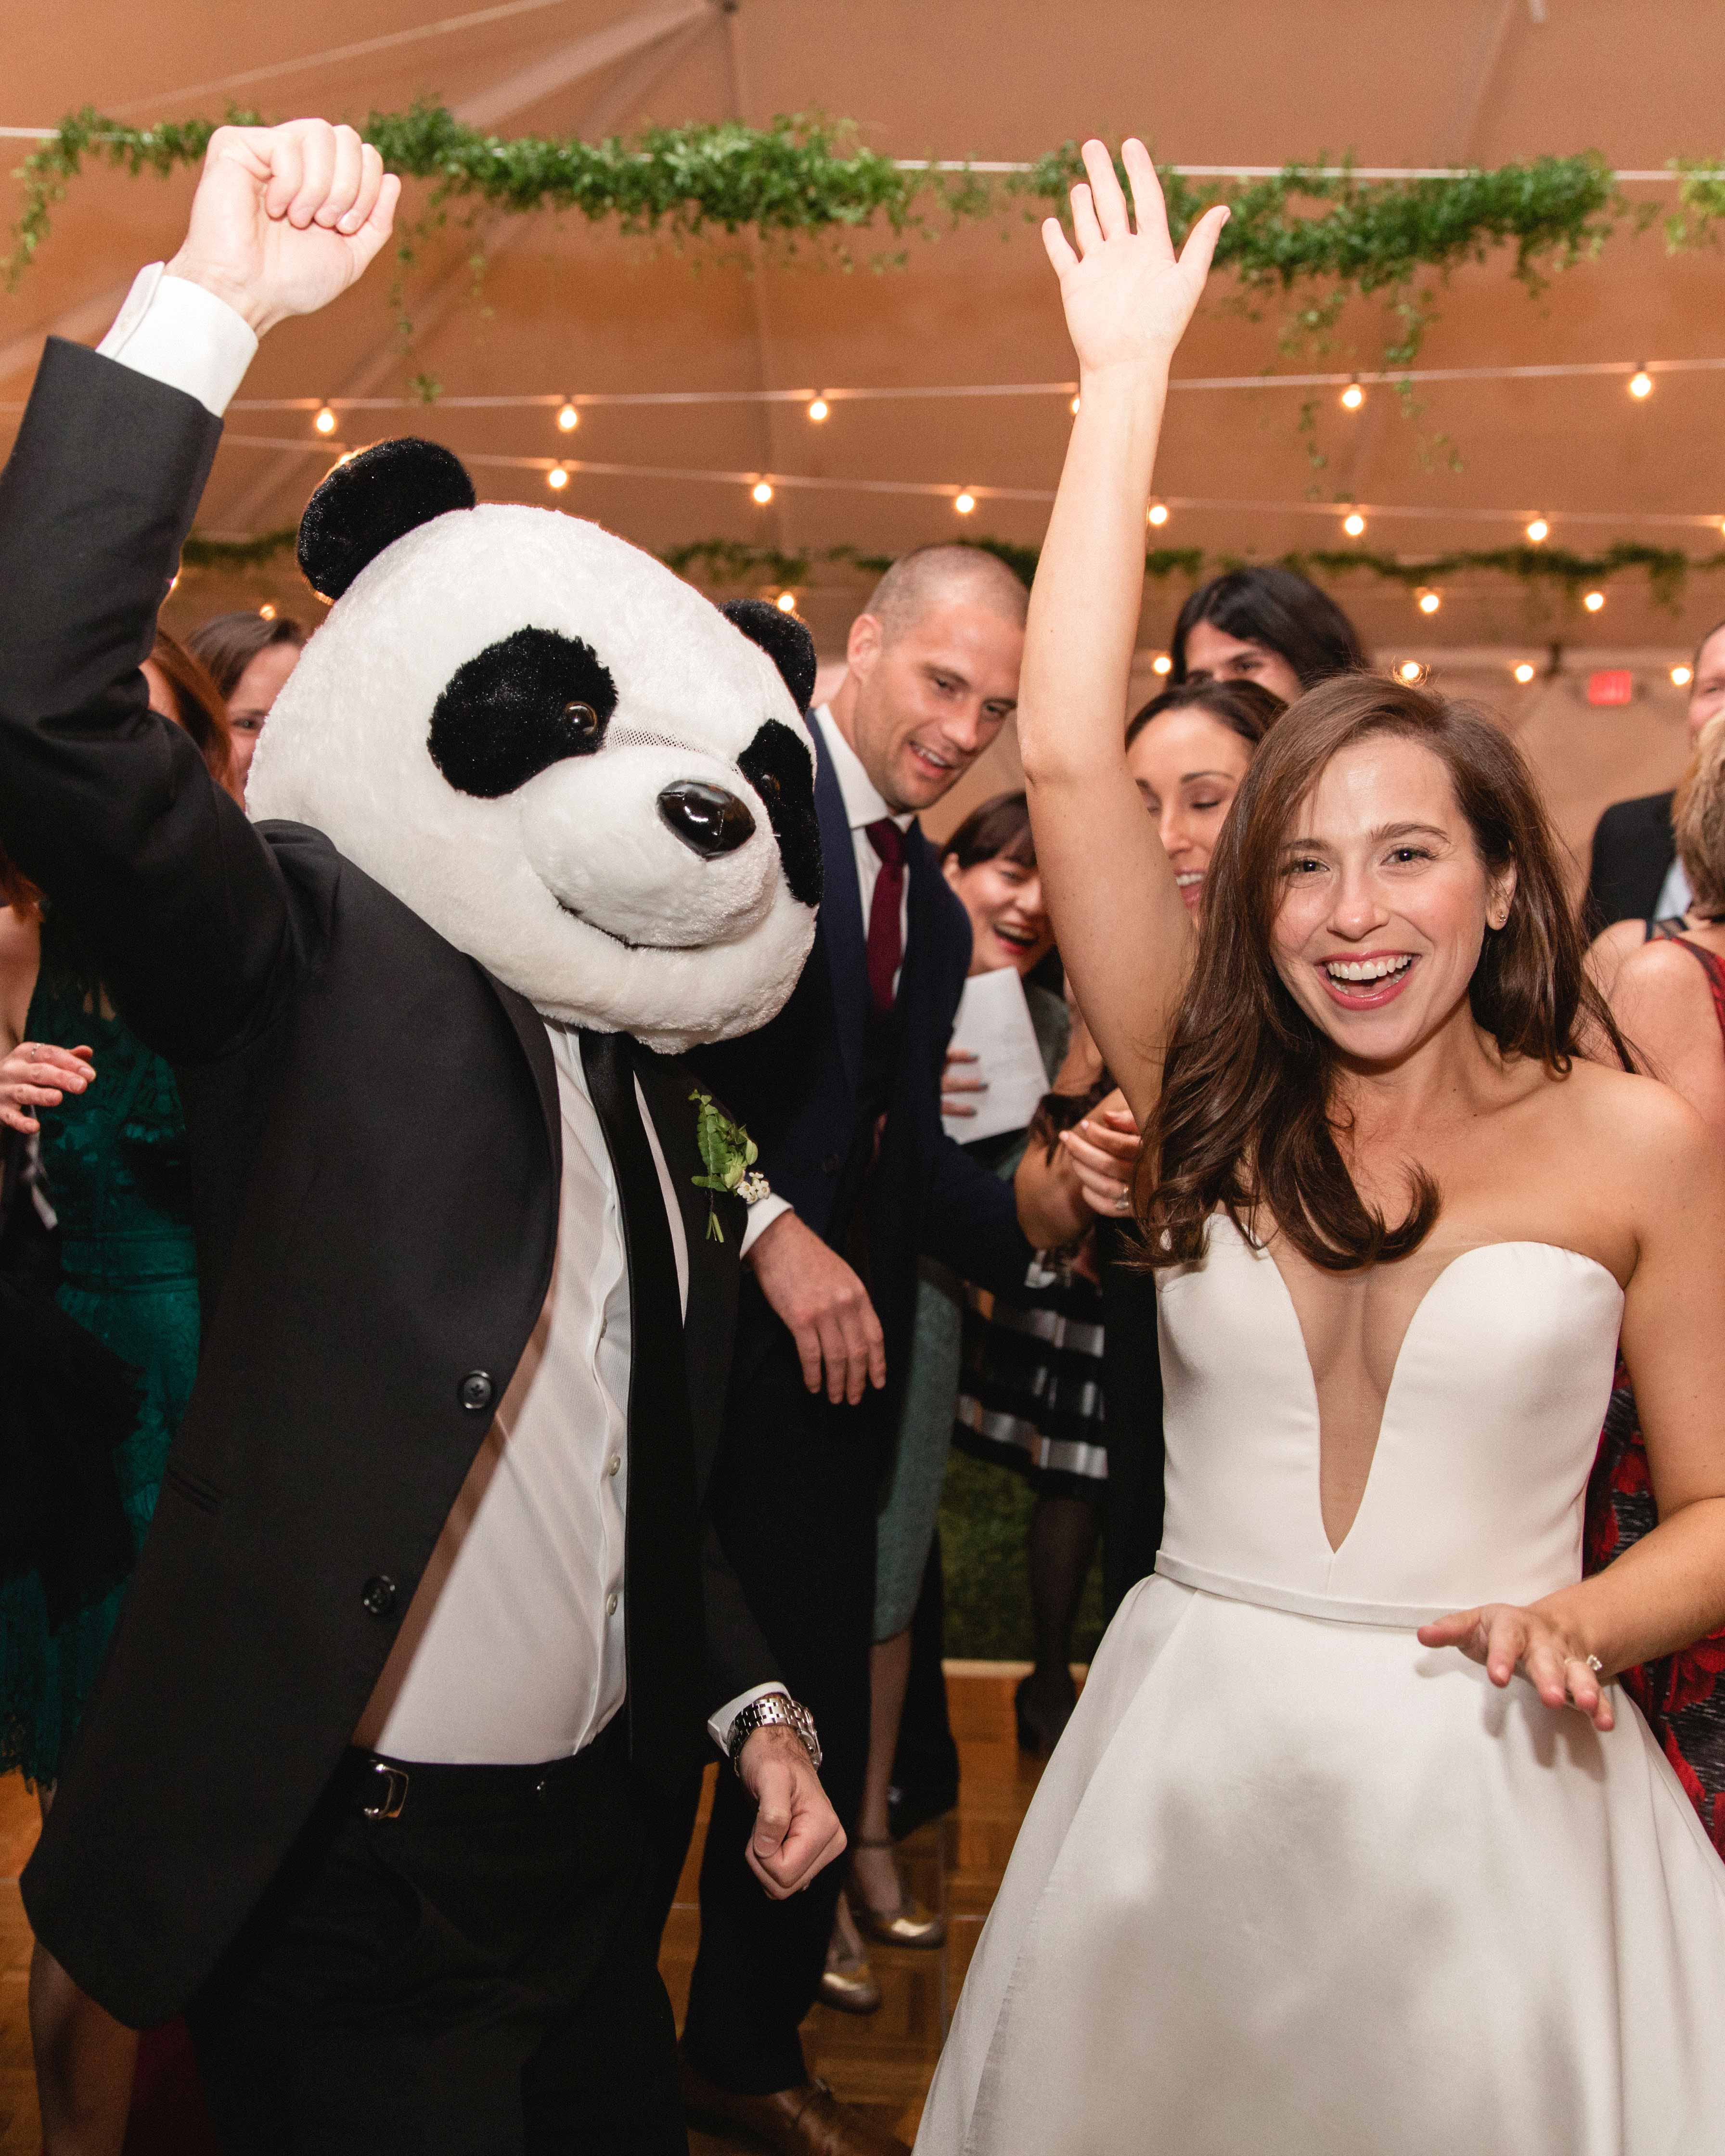 wedding dancing panda